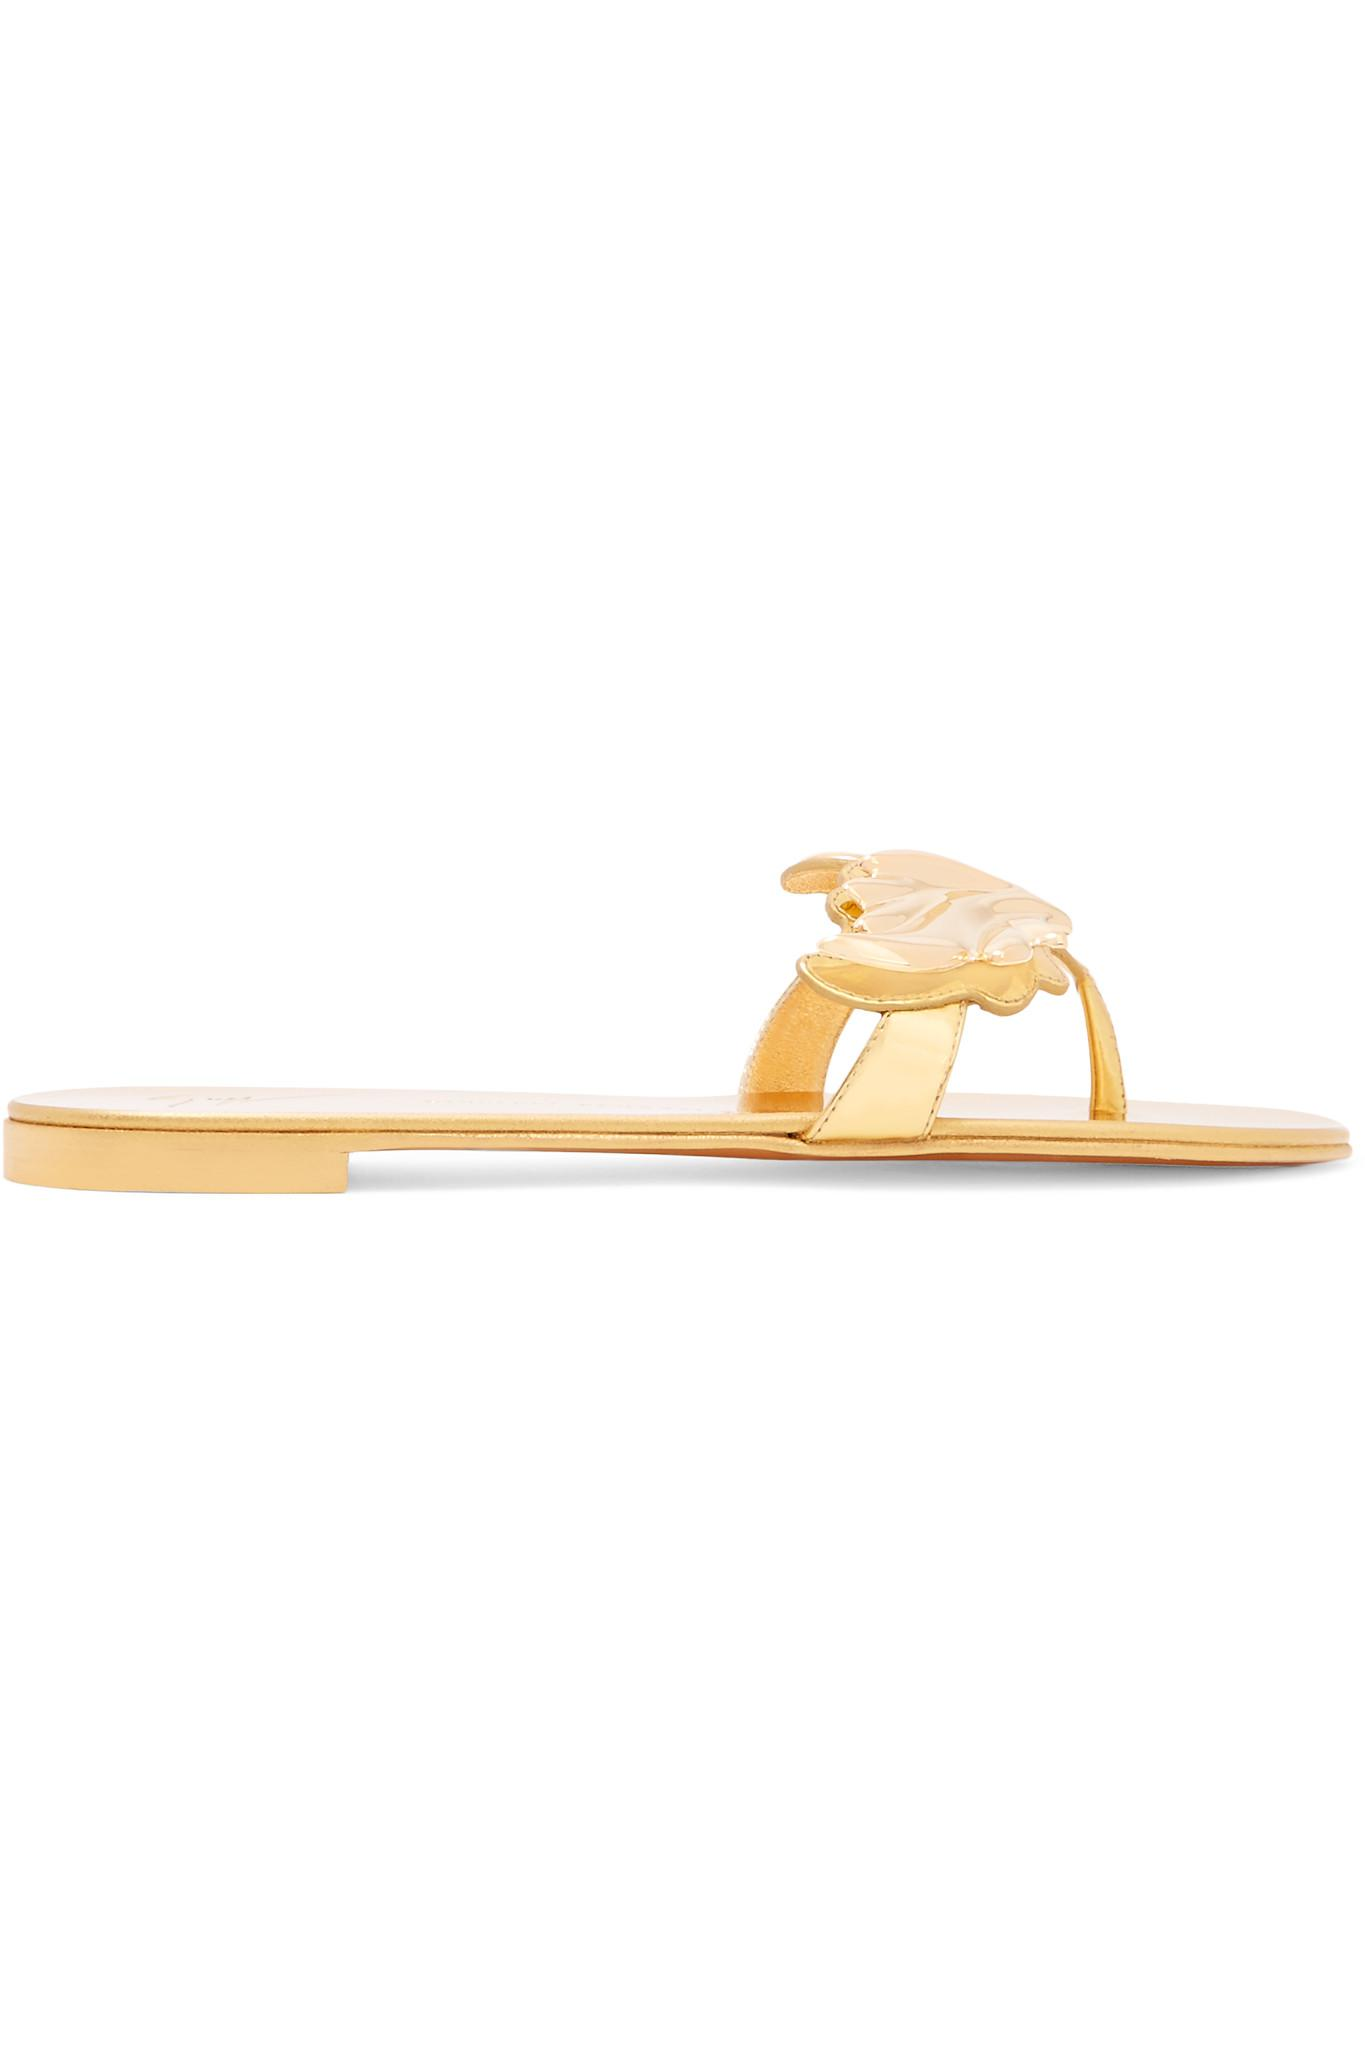 cbf82bc55f4993 Giuseppe Zanotti Embellished Metallic Patent-leather Sandals in ...